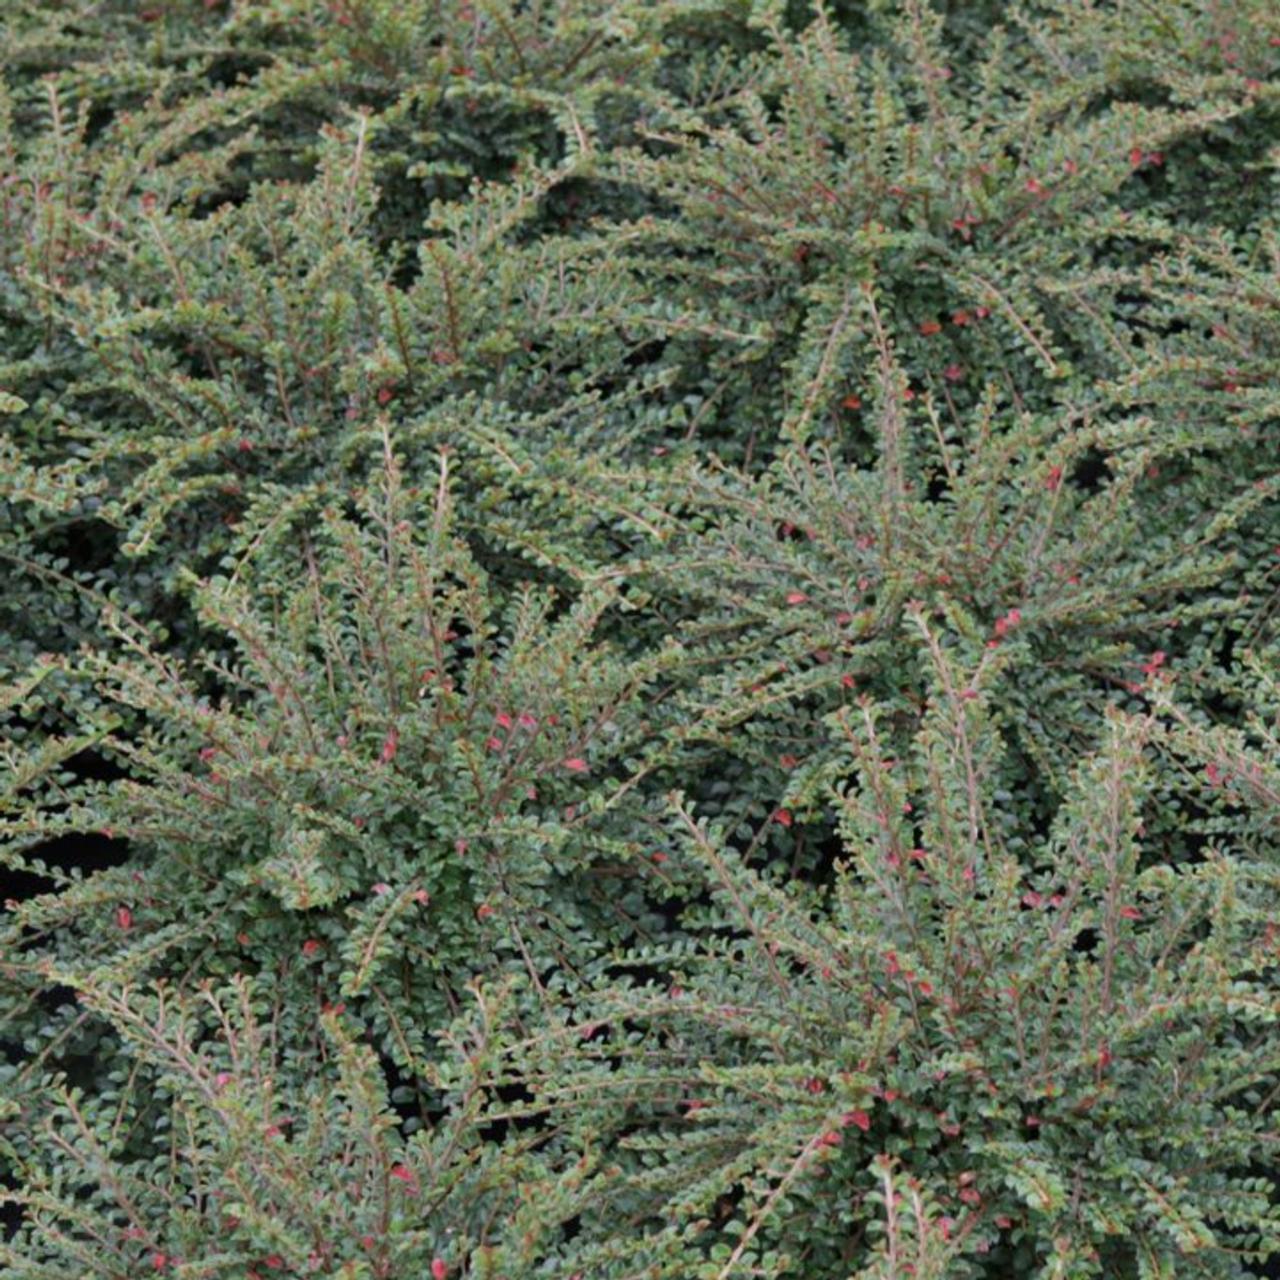 Cotoneaster adpressus 'Little Gem' plant